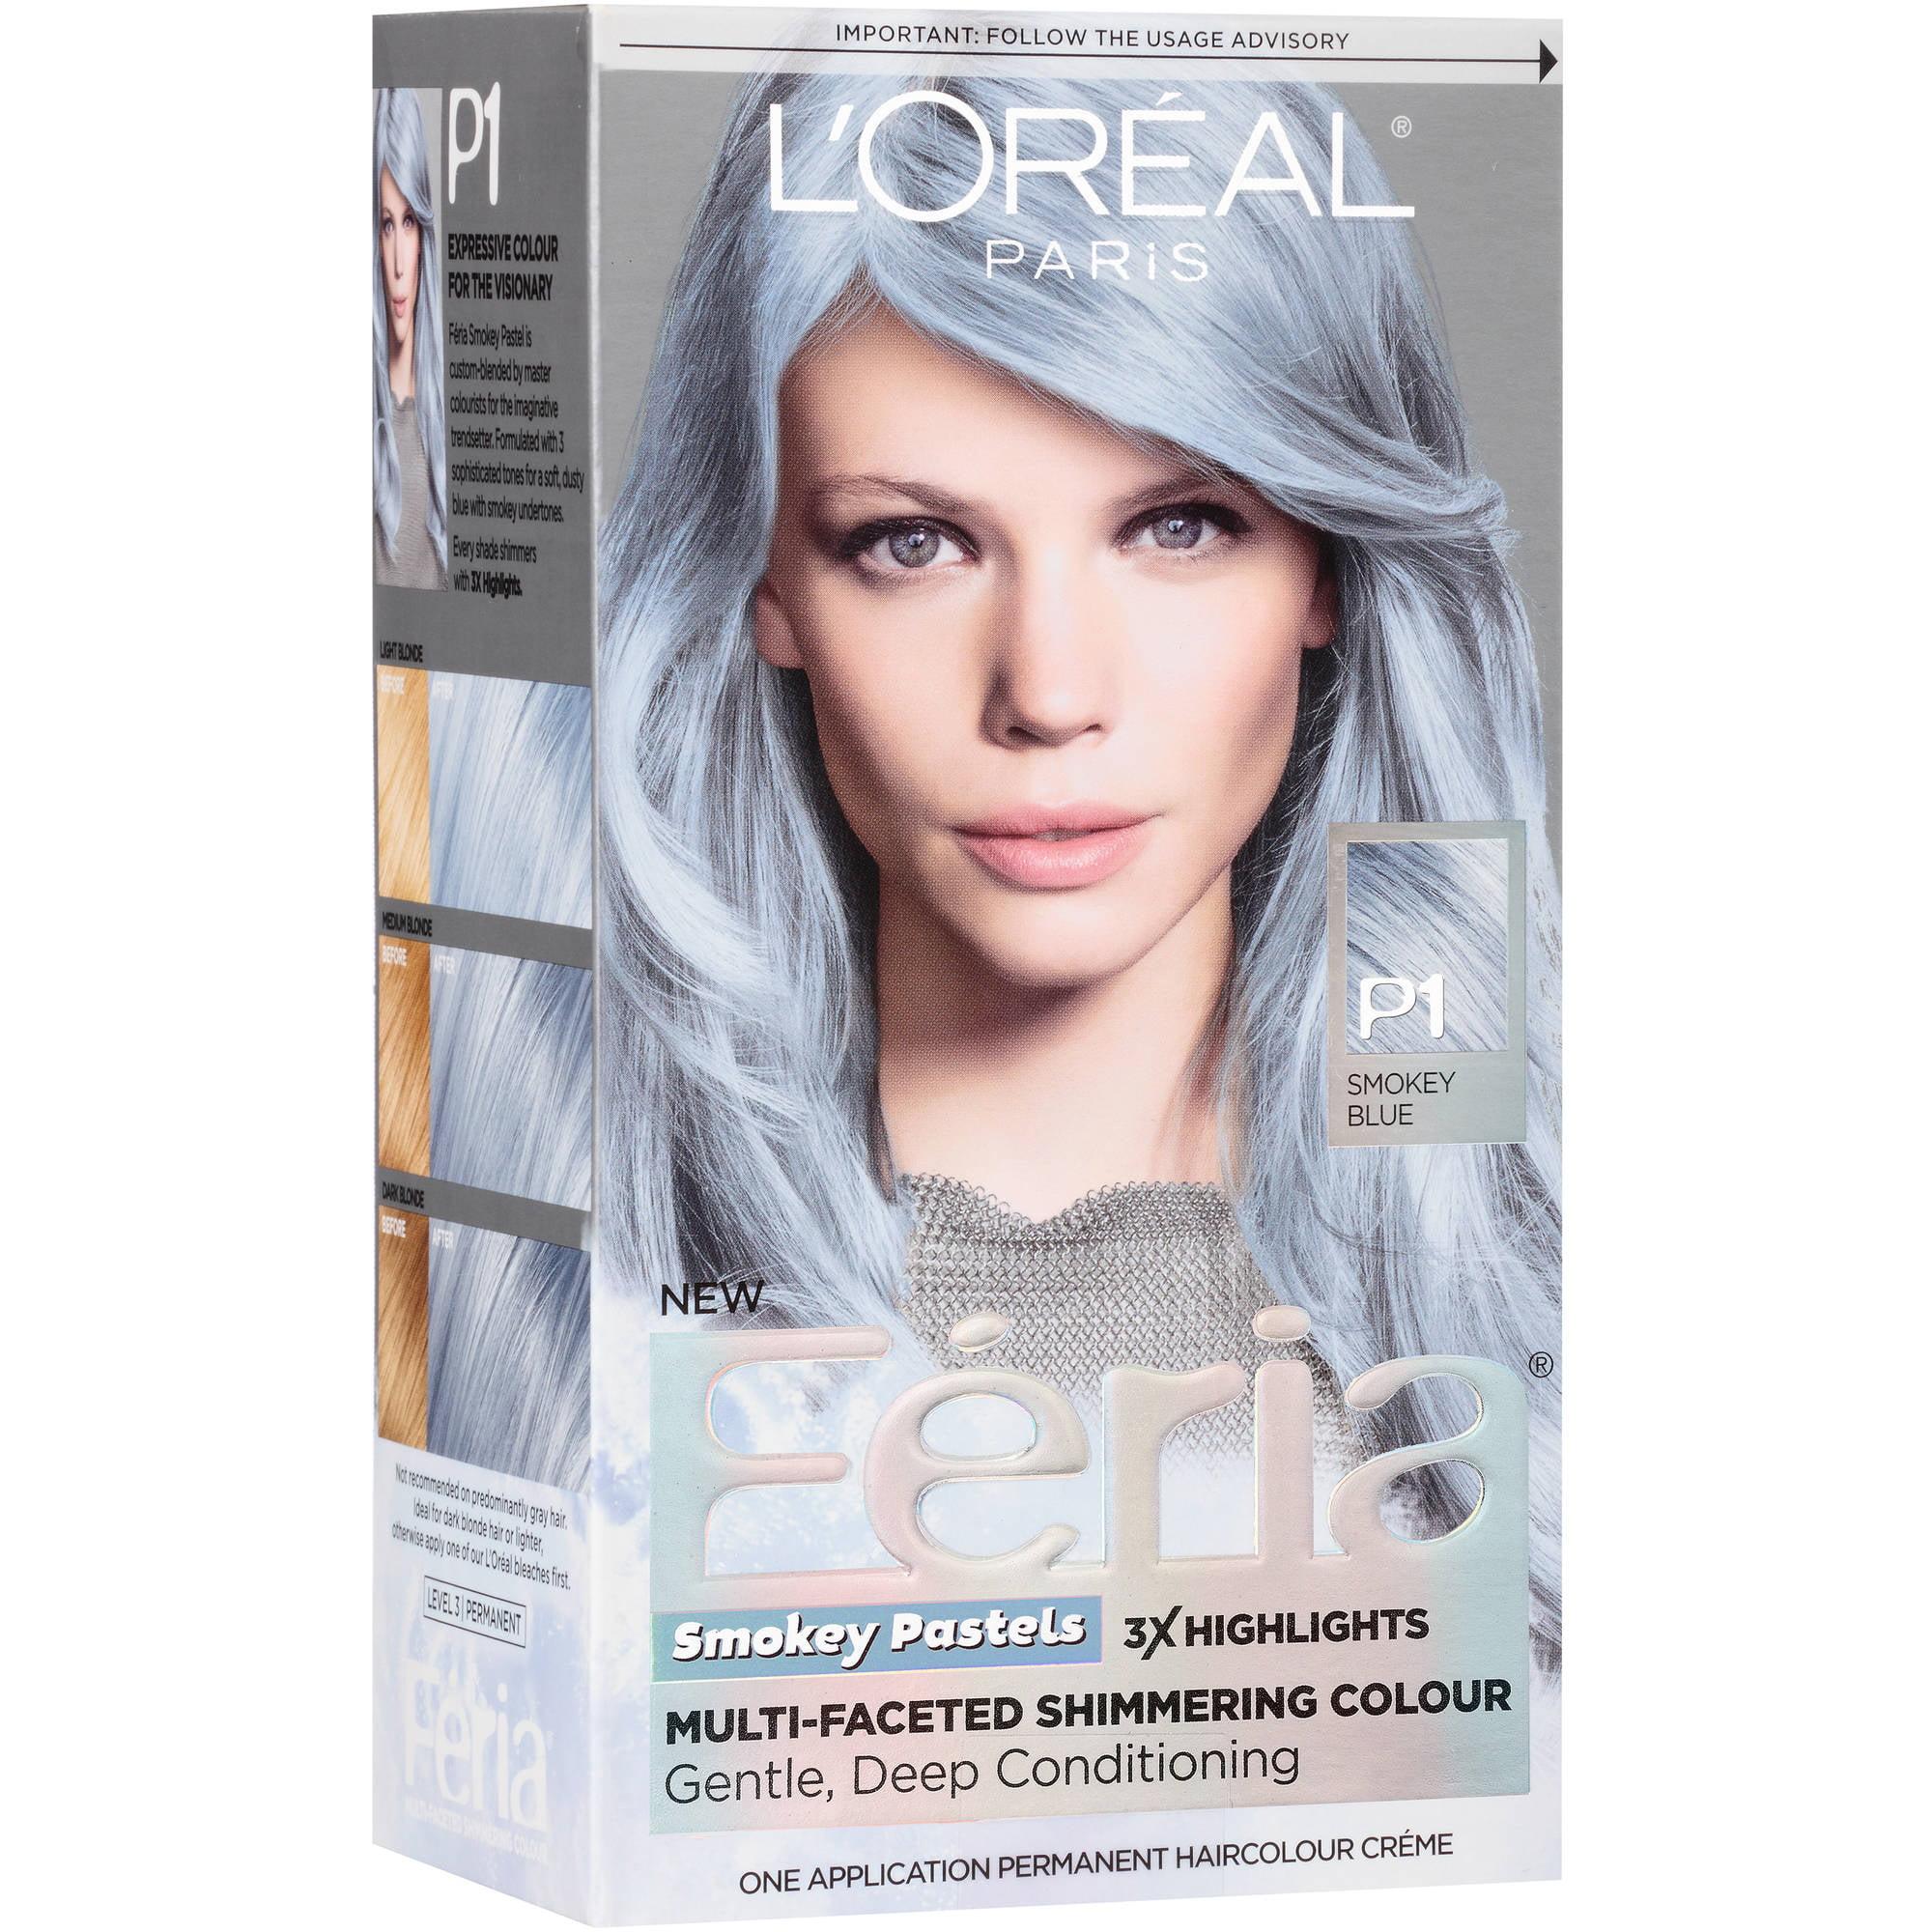 58a2b33e a336 472c 88c4 9562ff9f3b4f 1.7744c3e30ab4276f792ae2340b9c5016 - Inspirational Blue Hair Dye Walmart